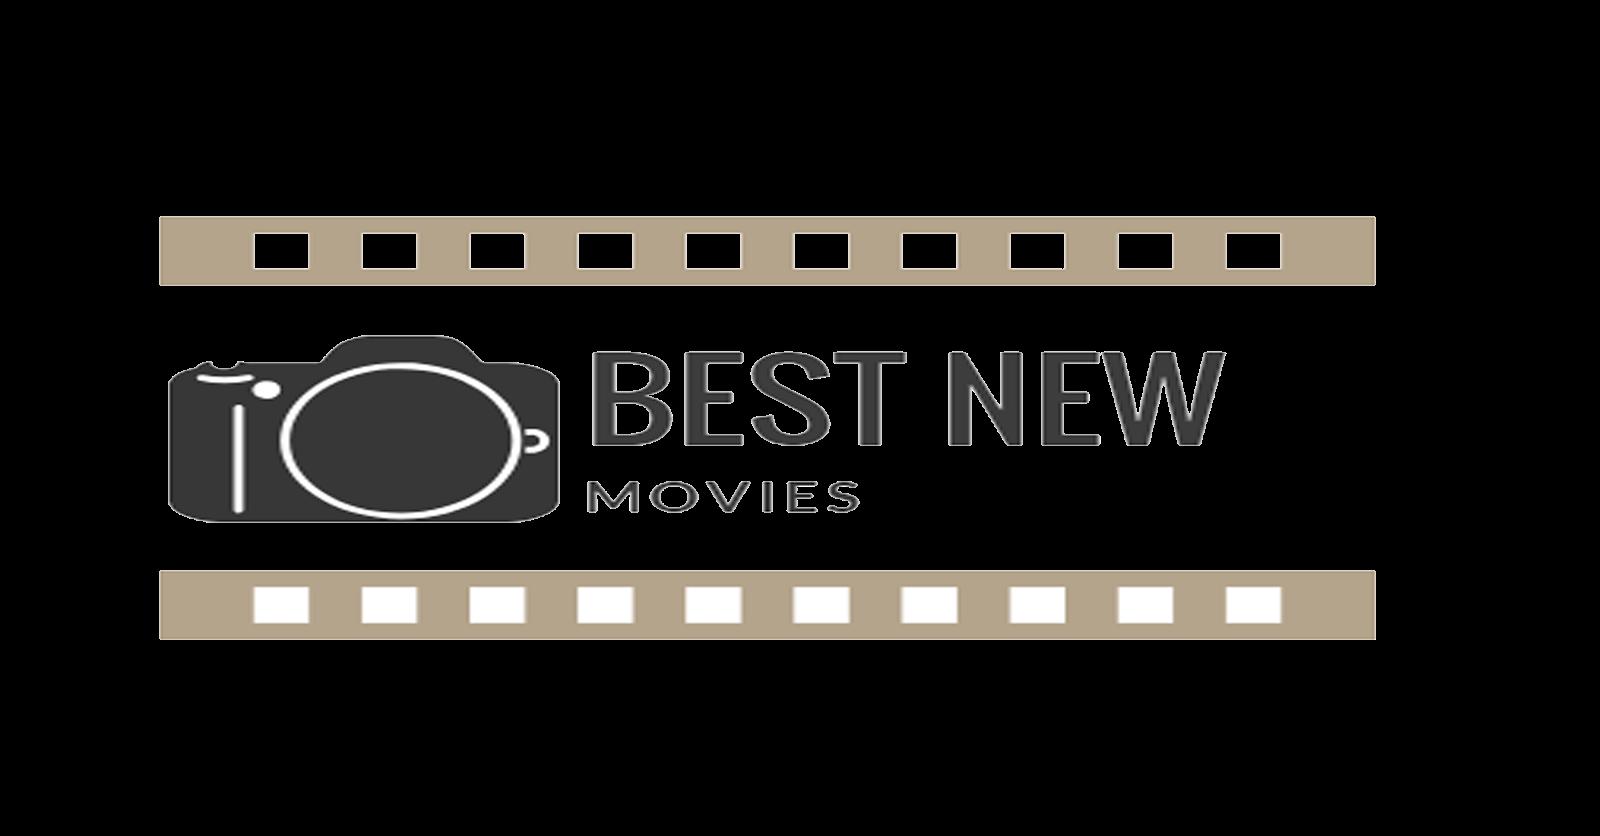 Byomkesh Season 3 Hoichoi Free Download - The Best New Movies